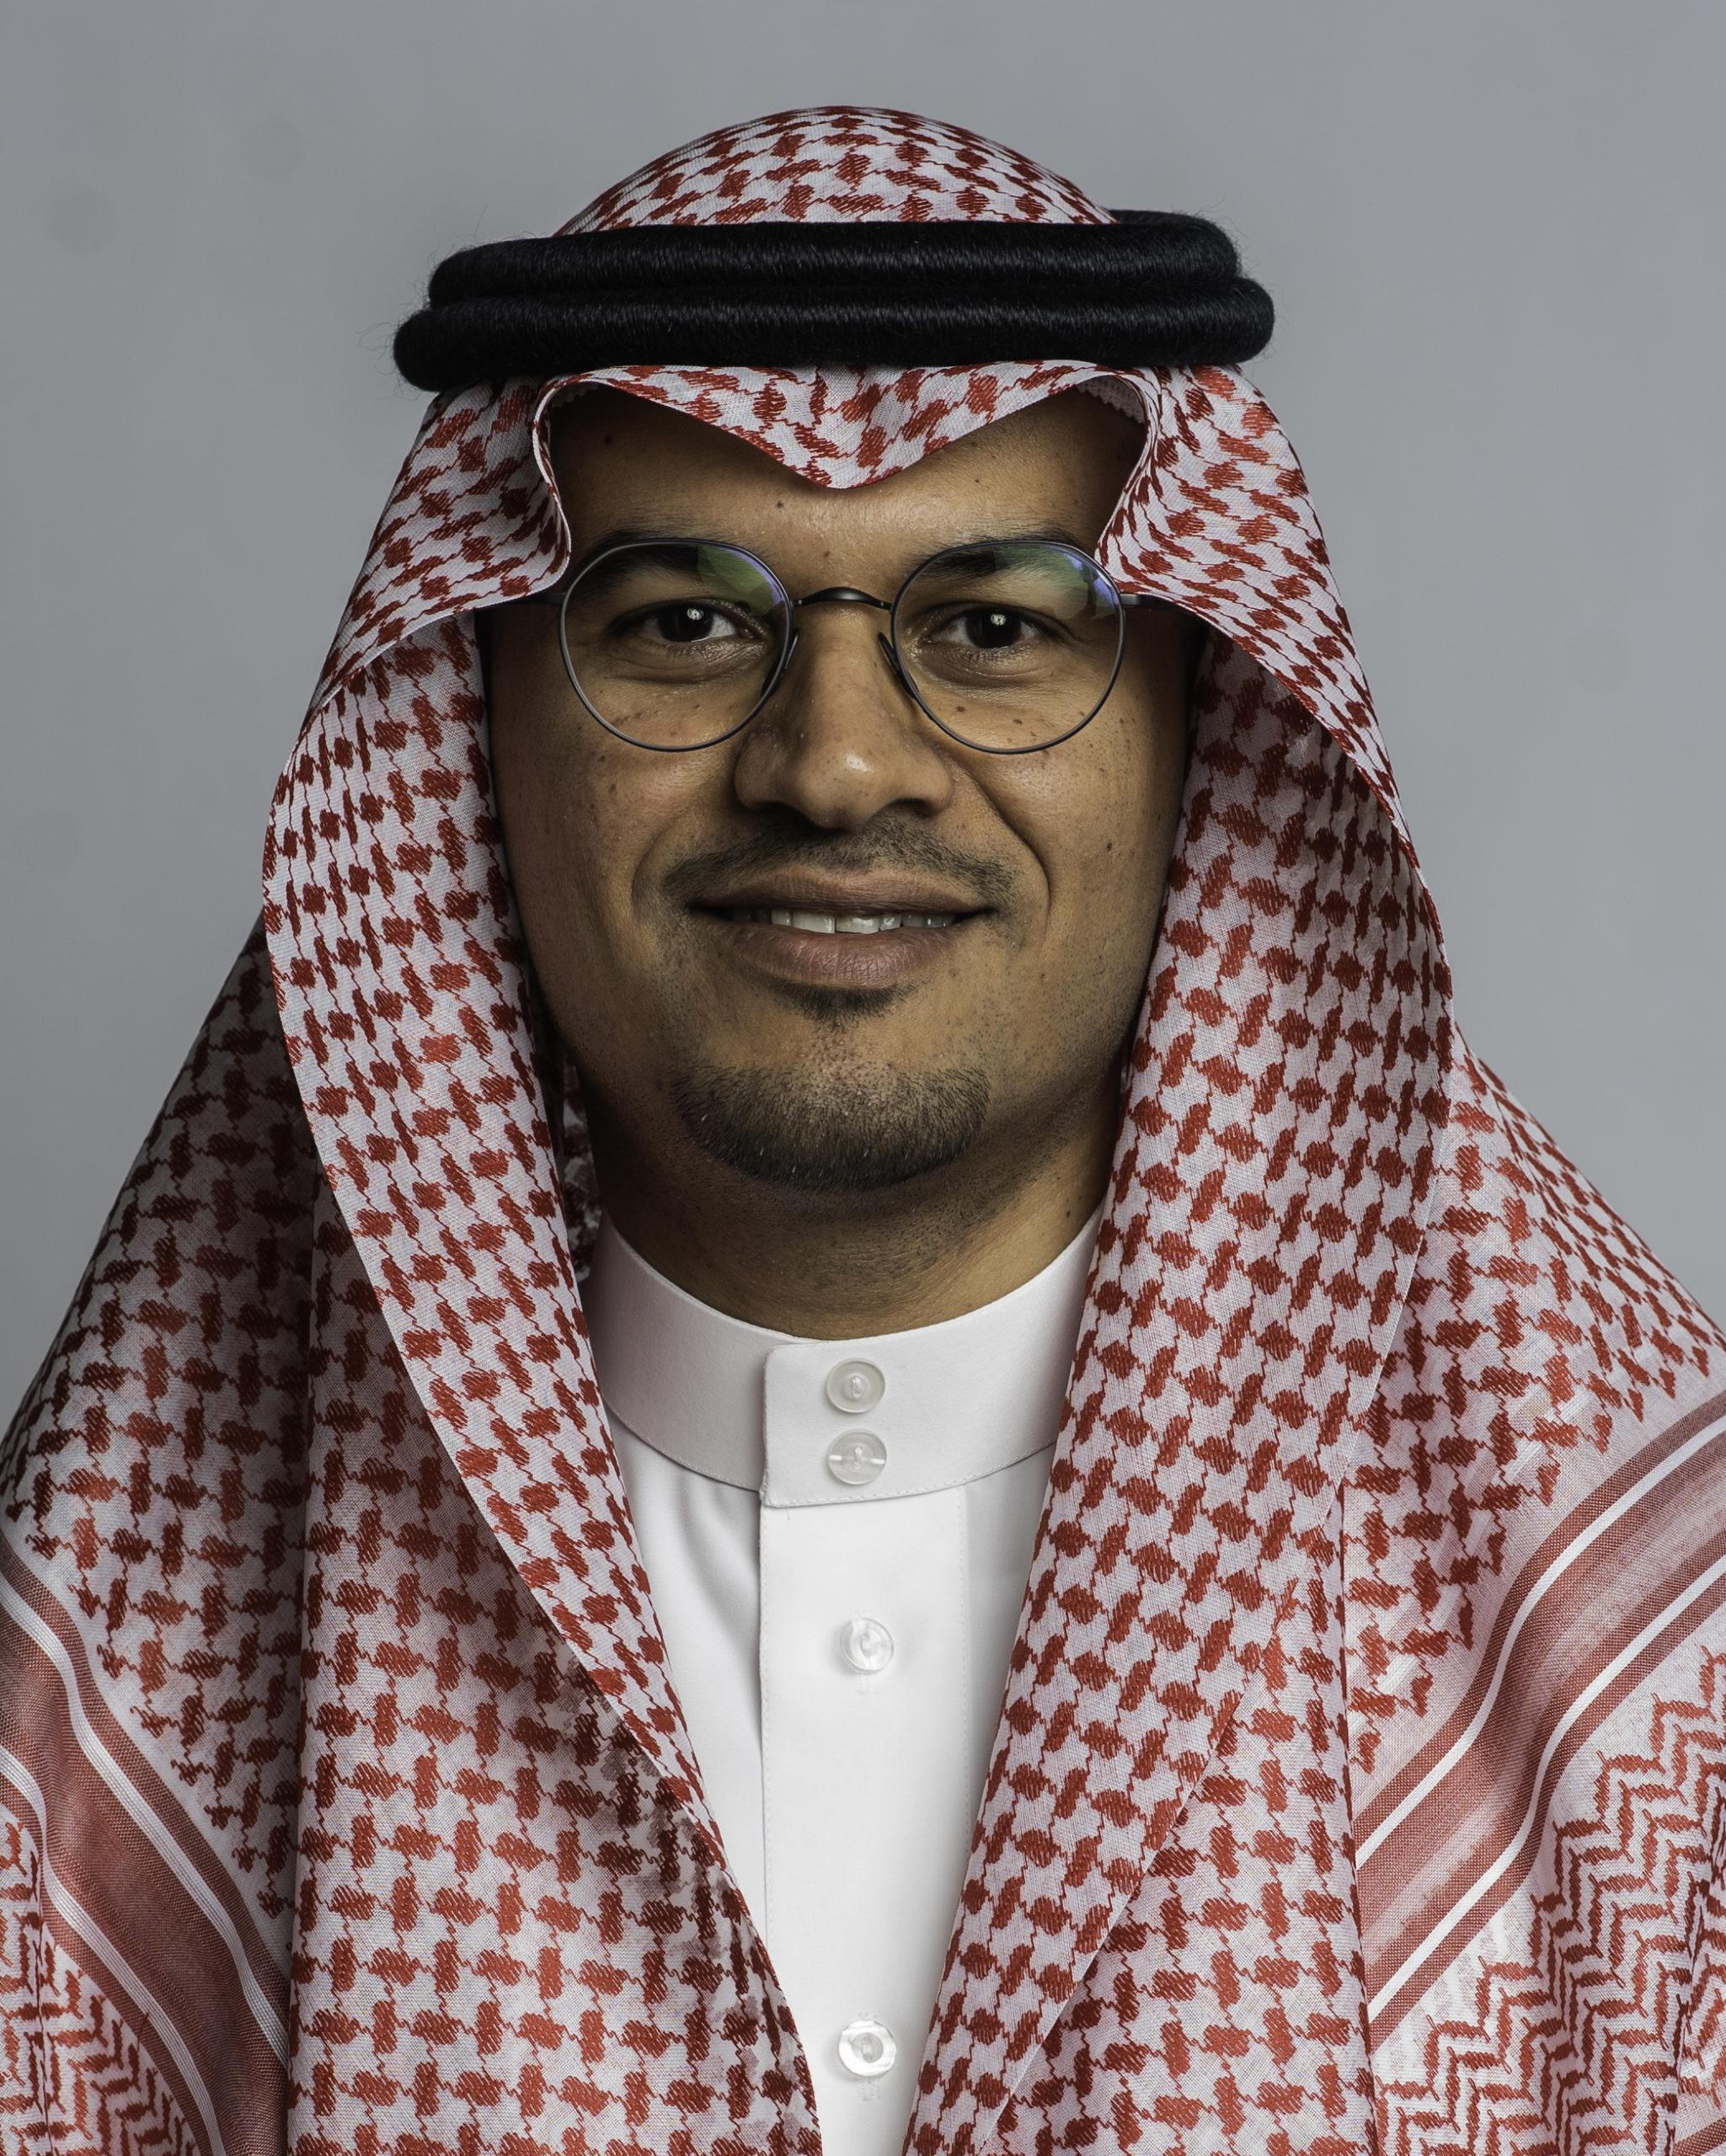 Mr. Fahad Abdullah Al Issa